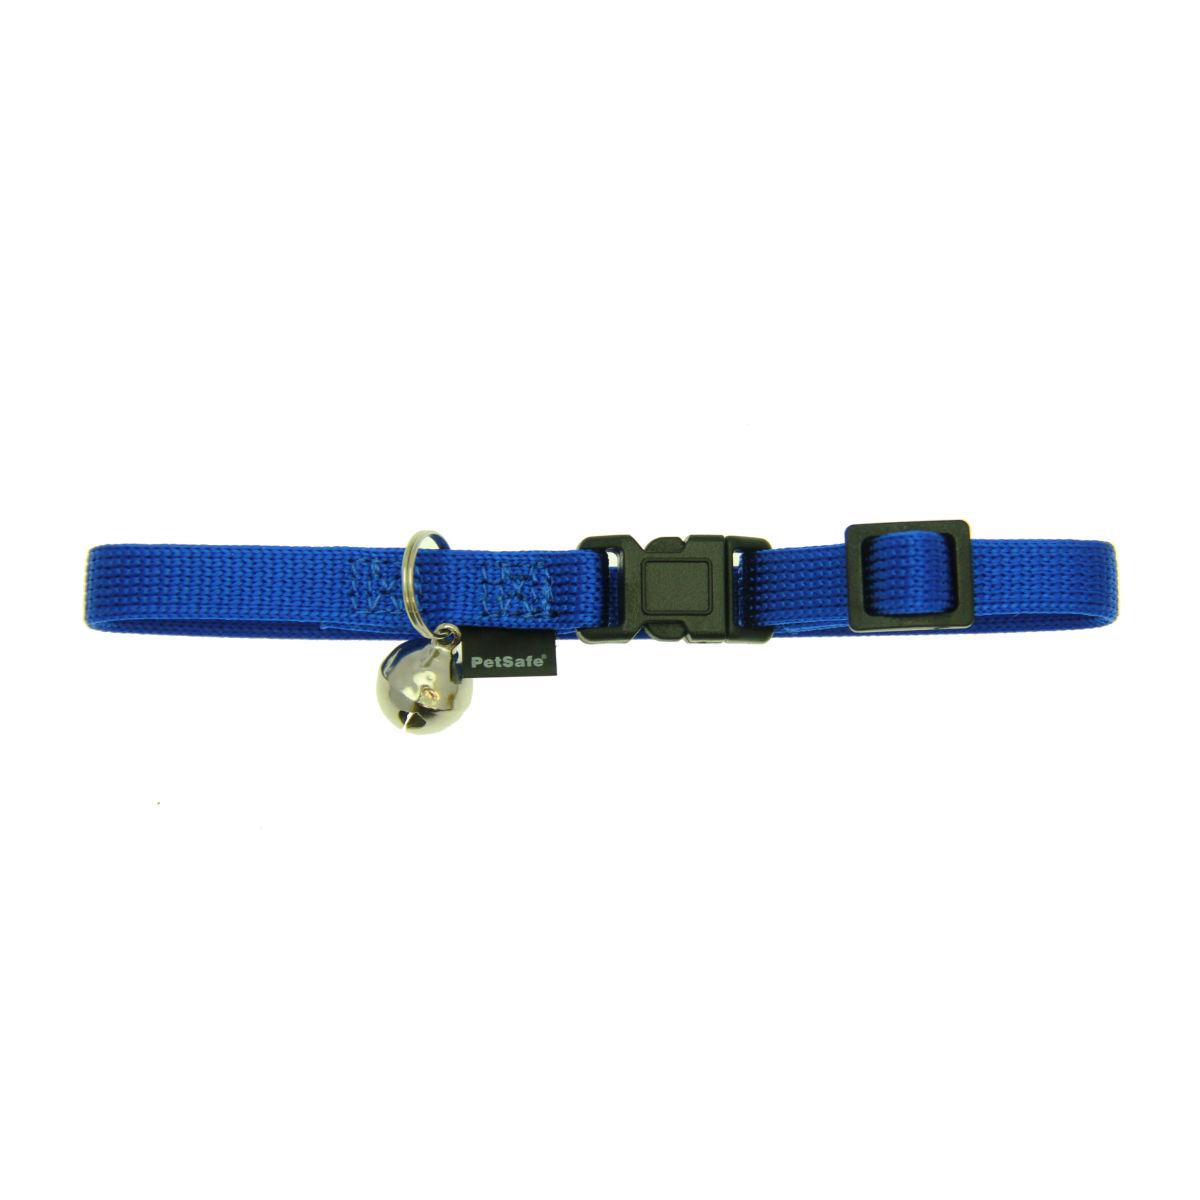 PetSafe Kitty Break-Away Cat Collar - Royal Blue